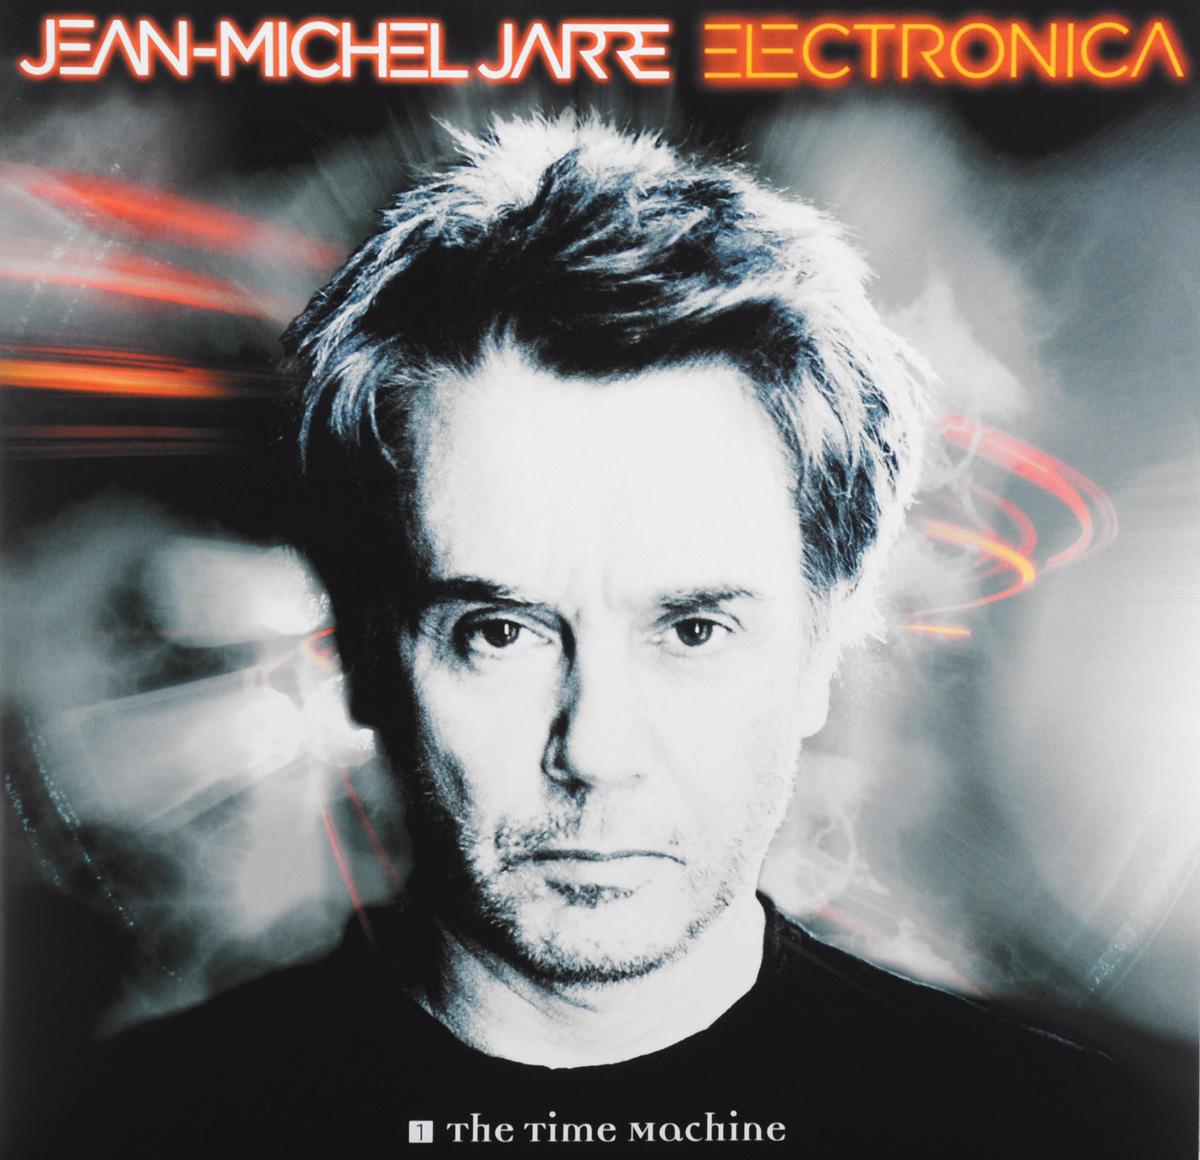 Жан-Мишель Жарр Jean Michel Jarre. Electronica 1 - The Time Machine (2 LP) жан мишель жарр jean michel jarre electronica 1 the time machine